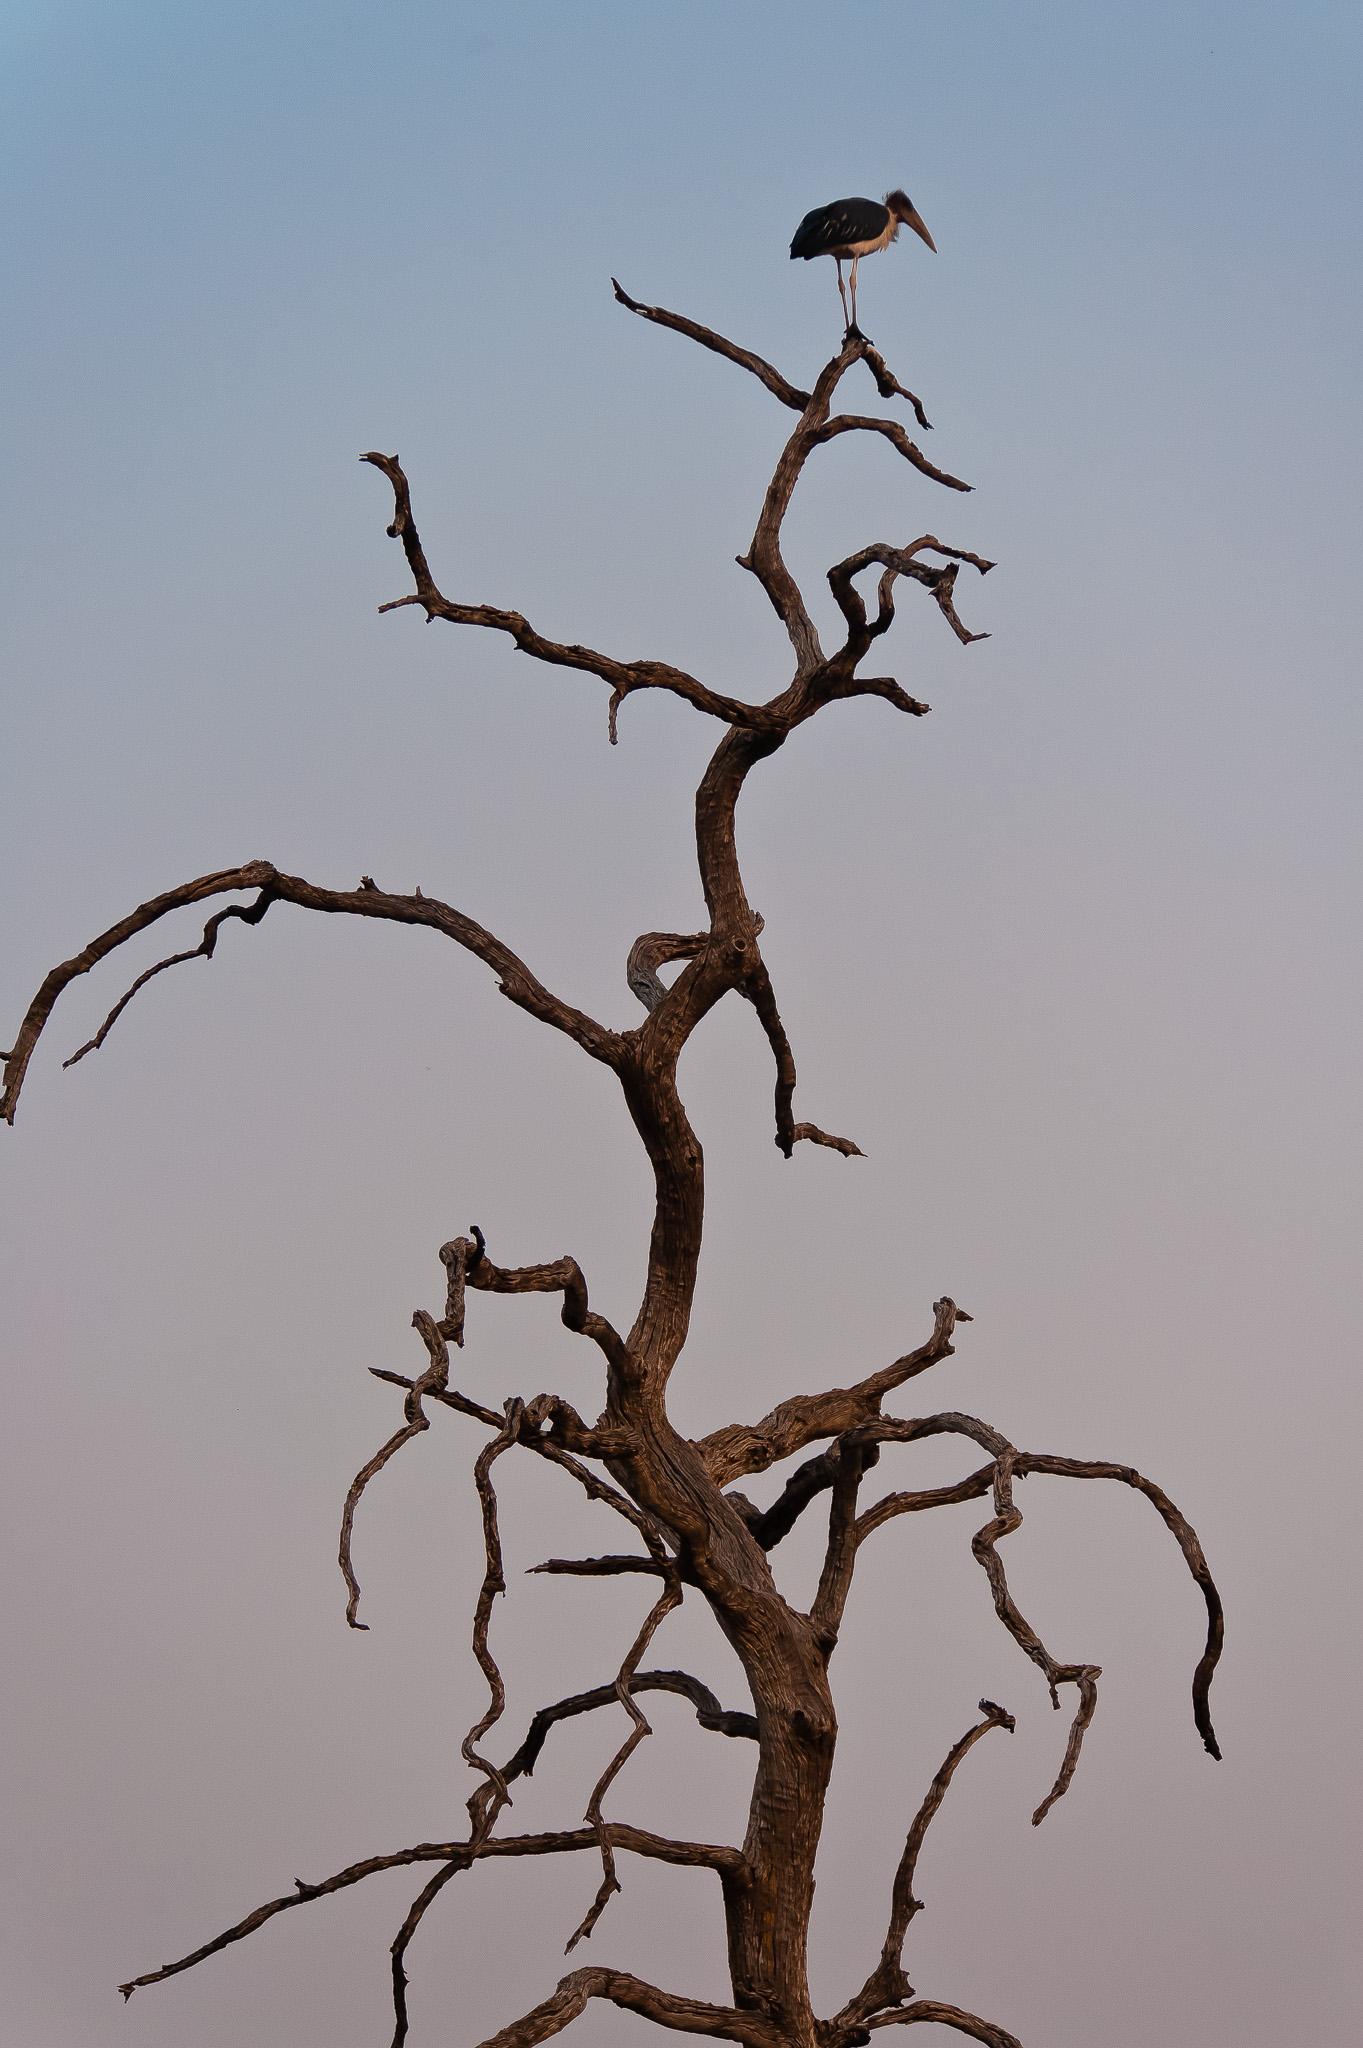 Marabou Stork, Chobe NP, Botswana